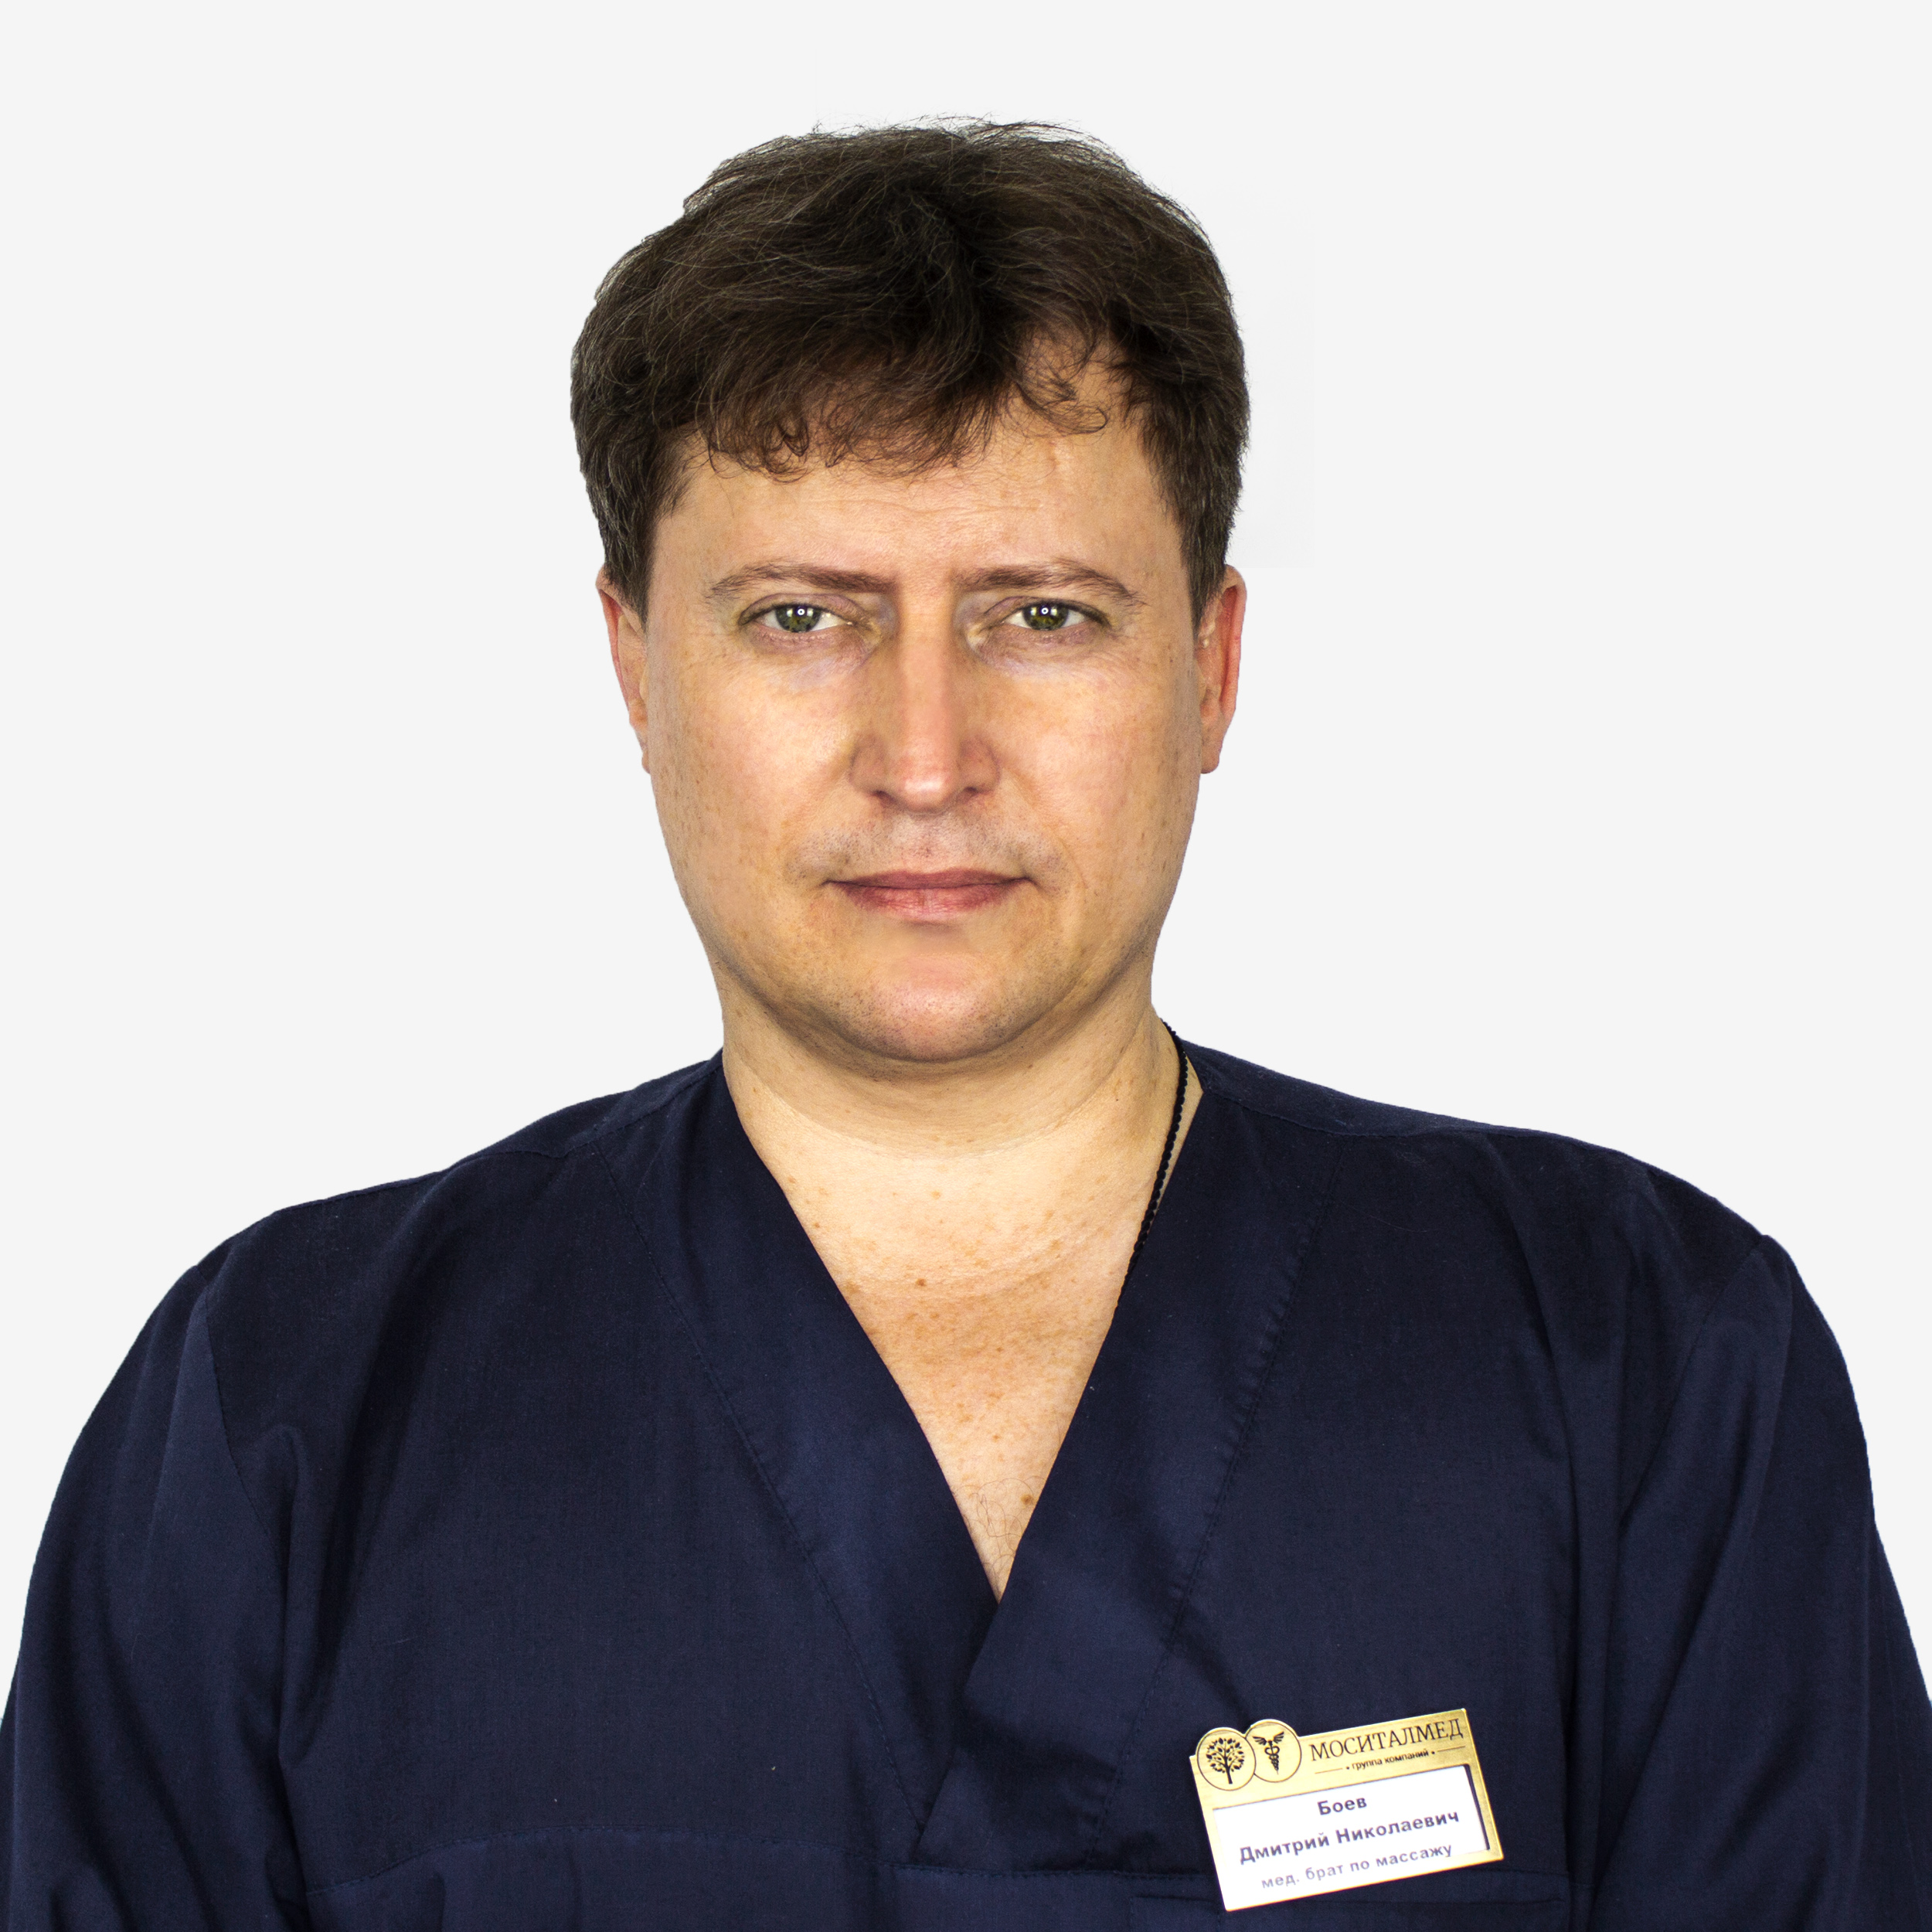 Боев Дмитрий Николаевич